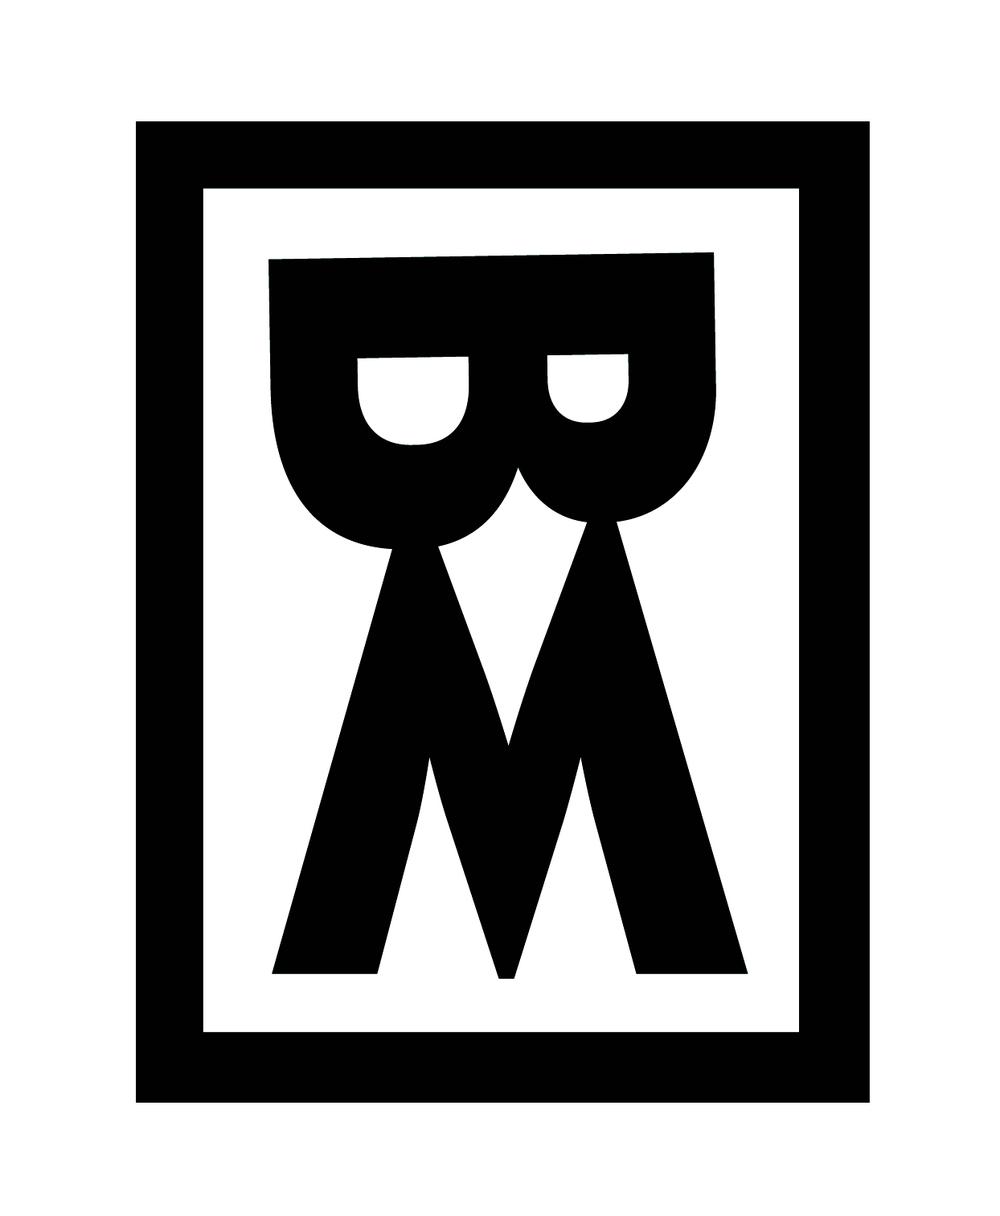 www.bewegungsmelder.ch